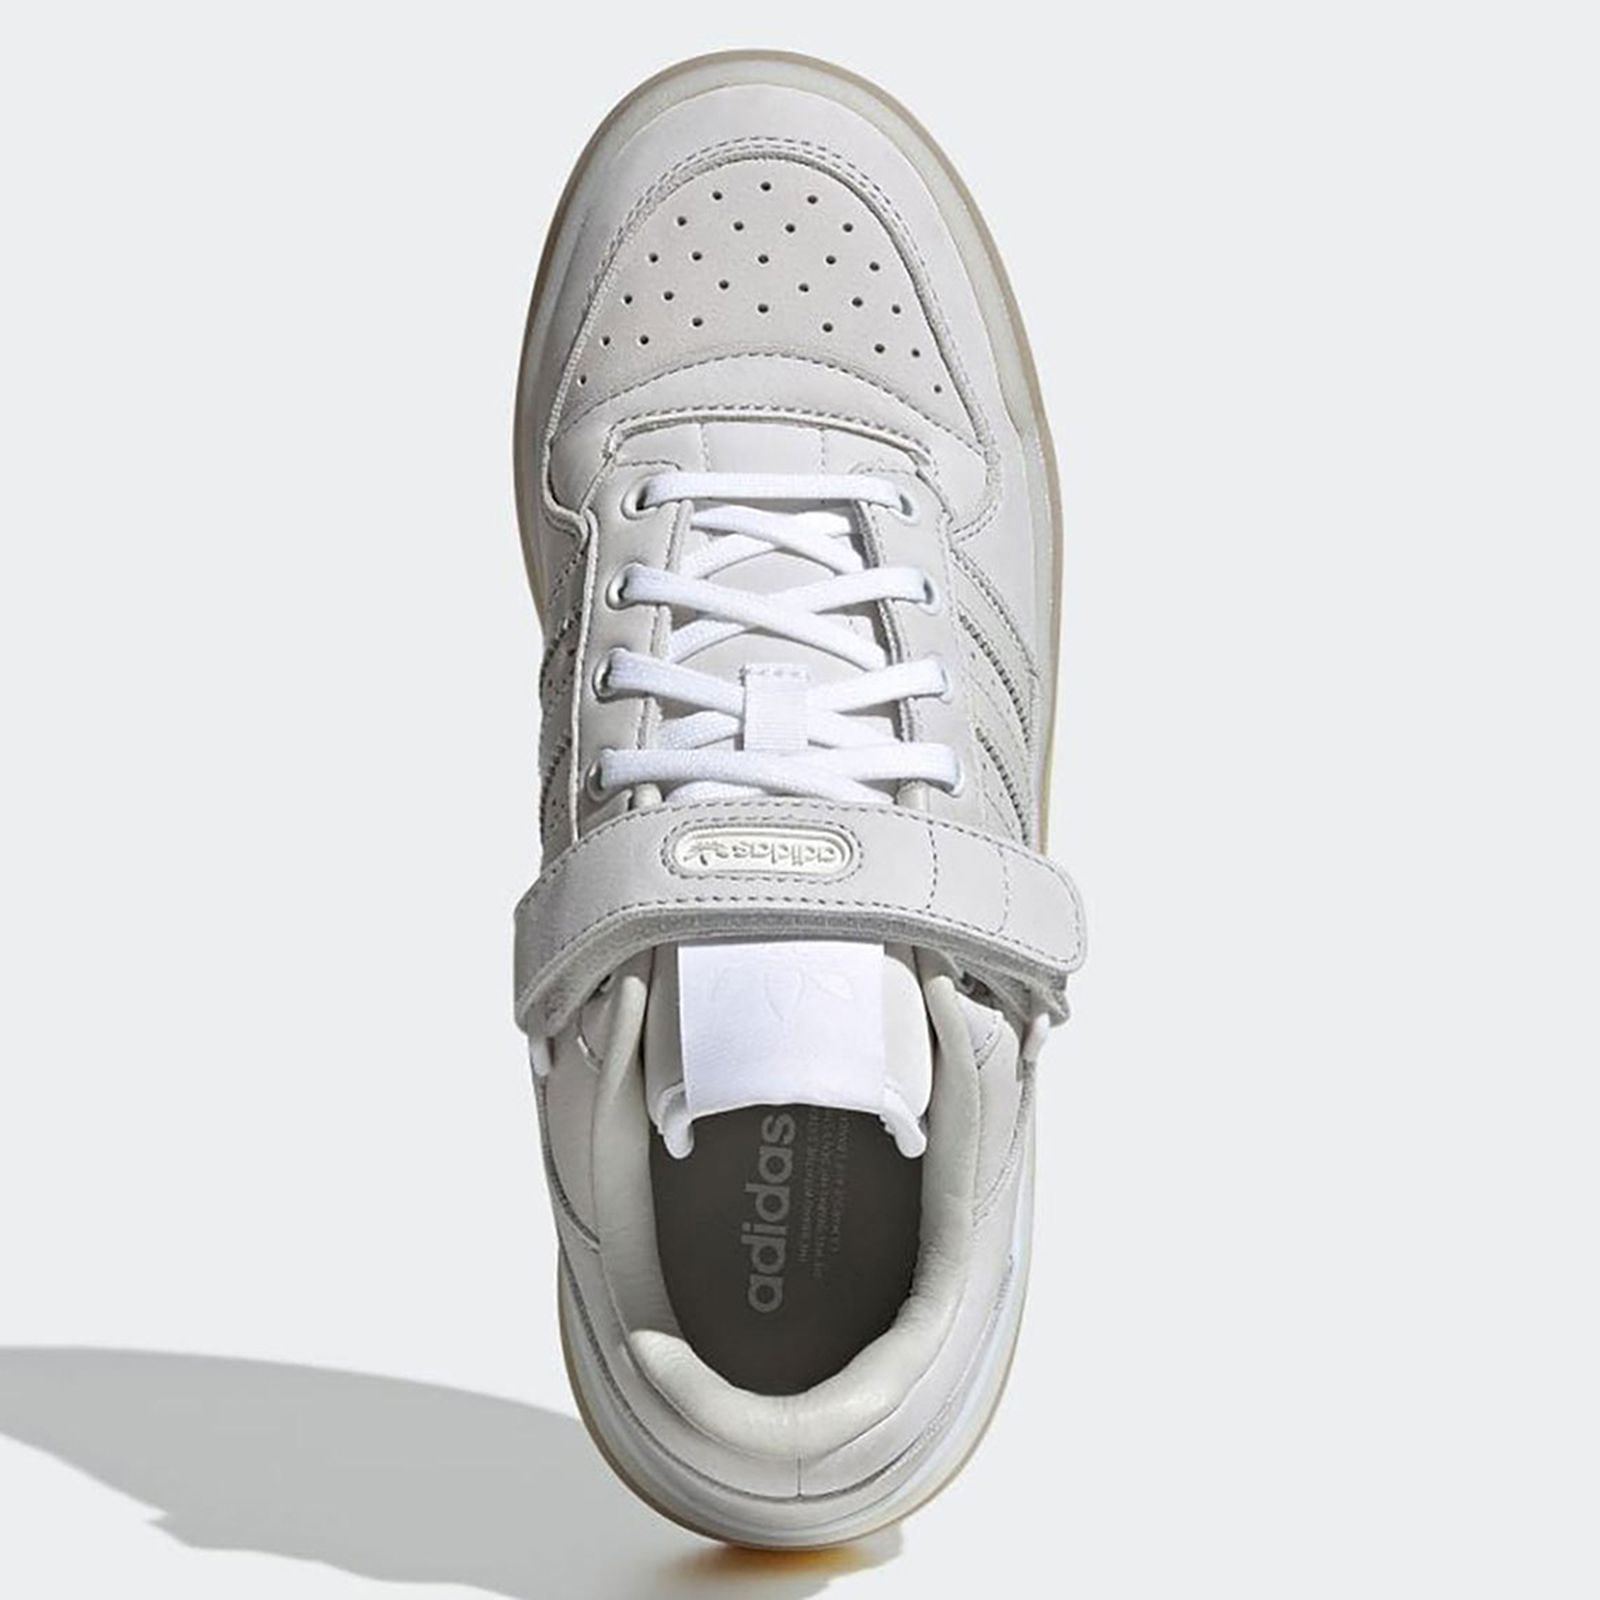 adidas-triple-platforum-lo-crystal-white-release-date-price-04